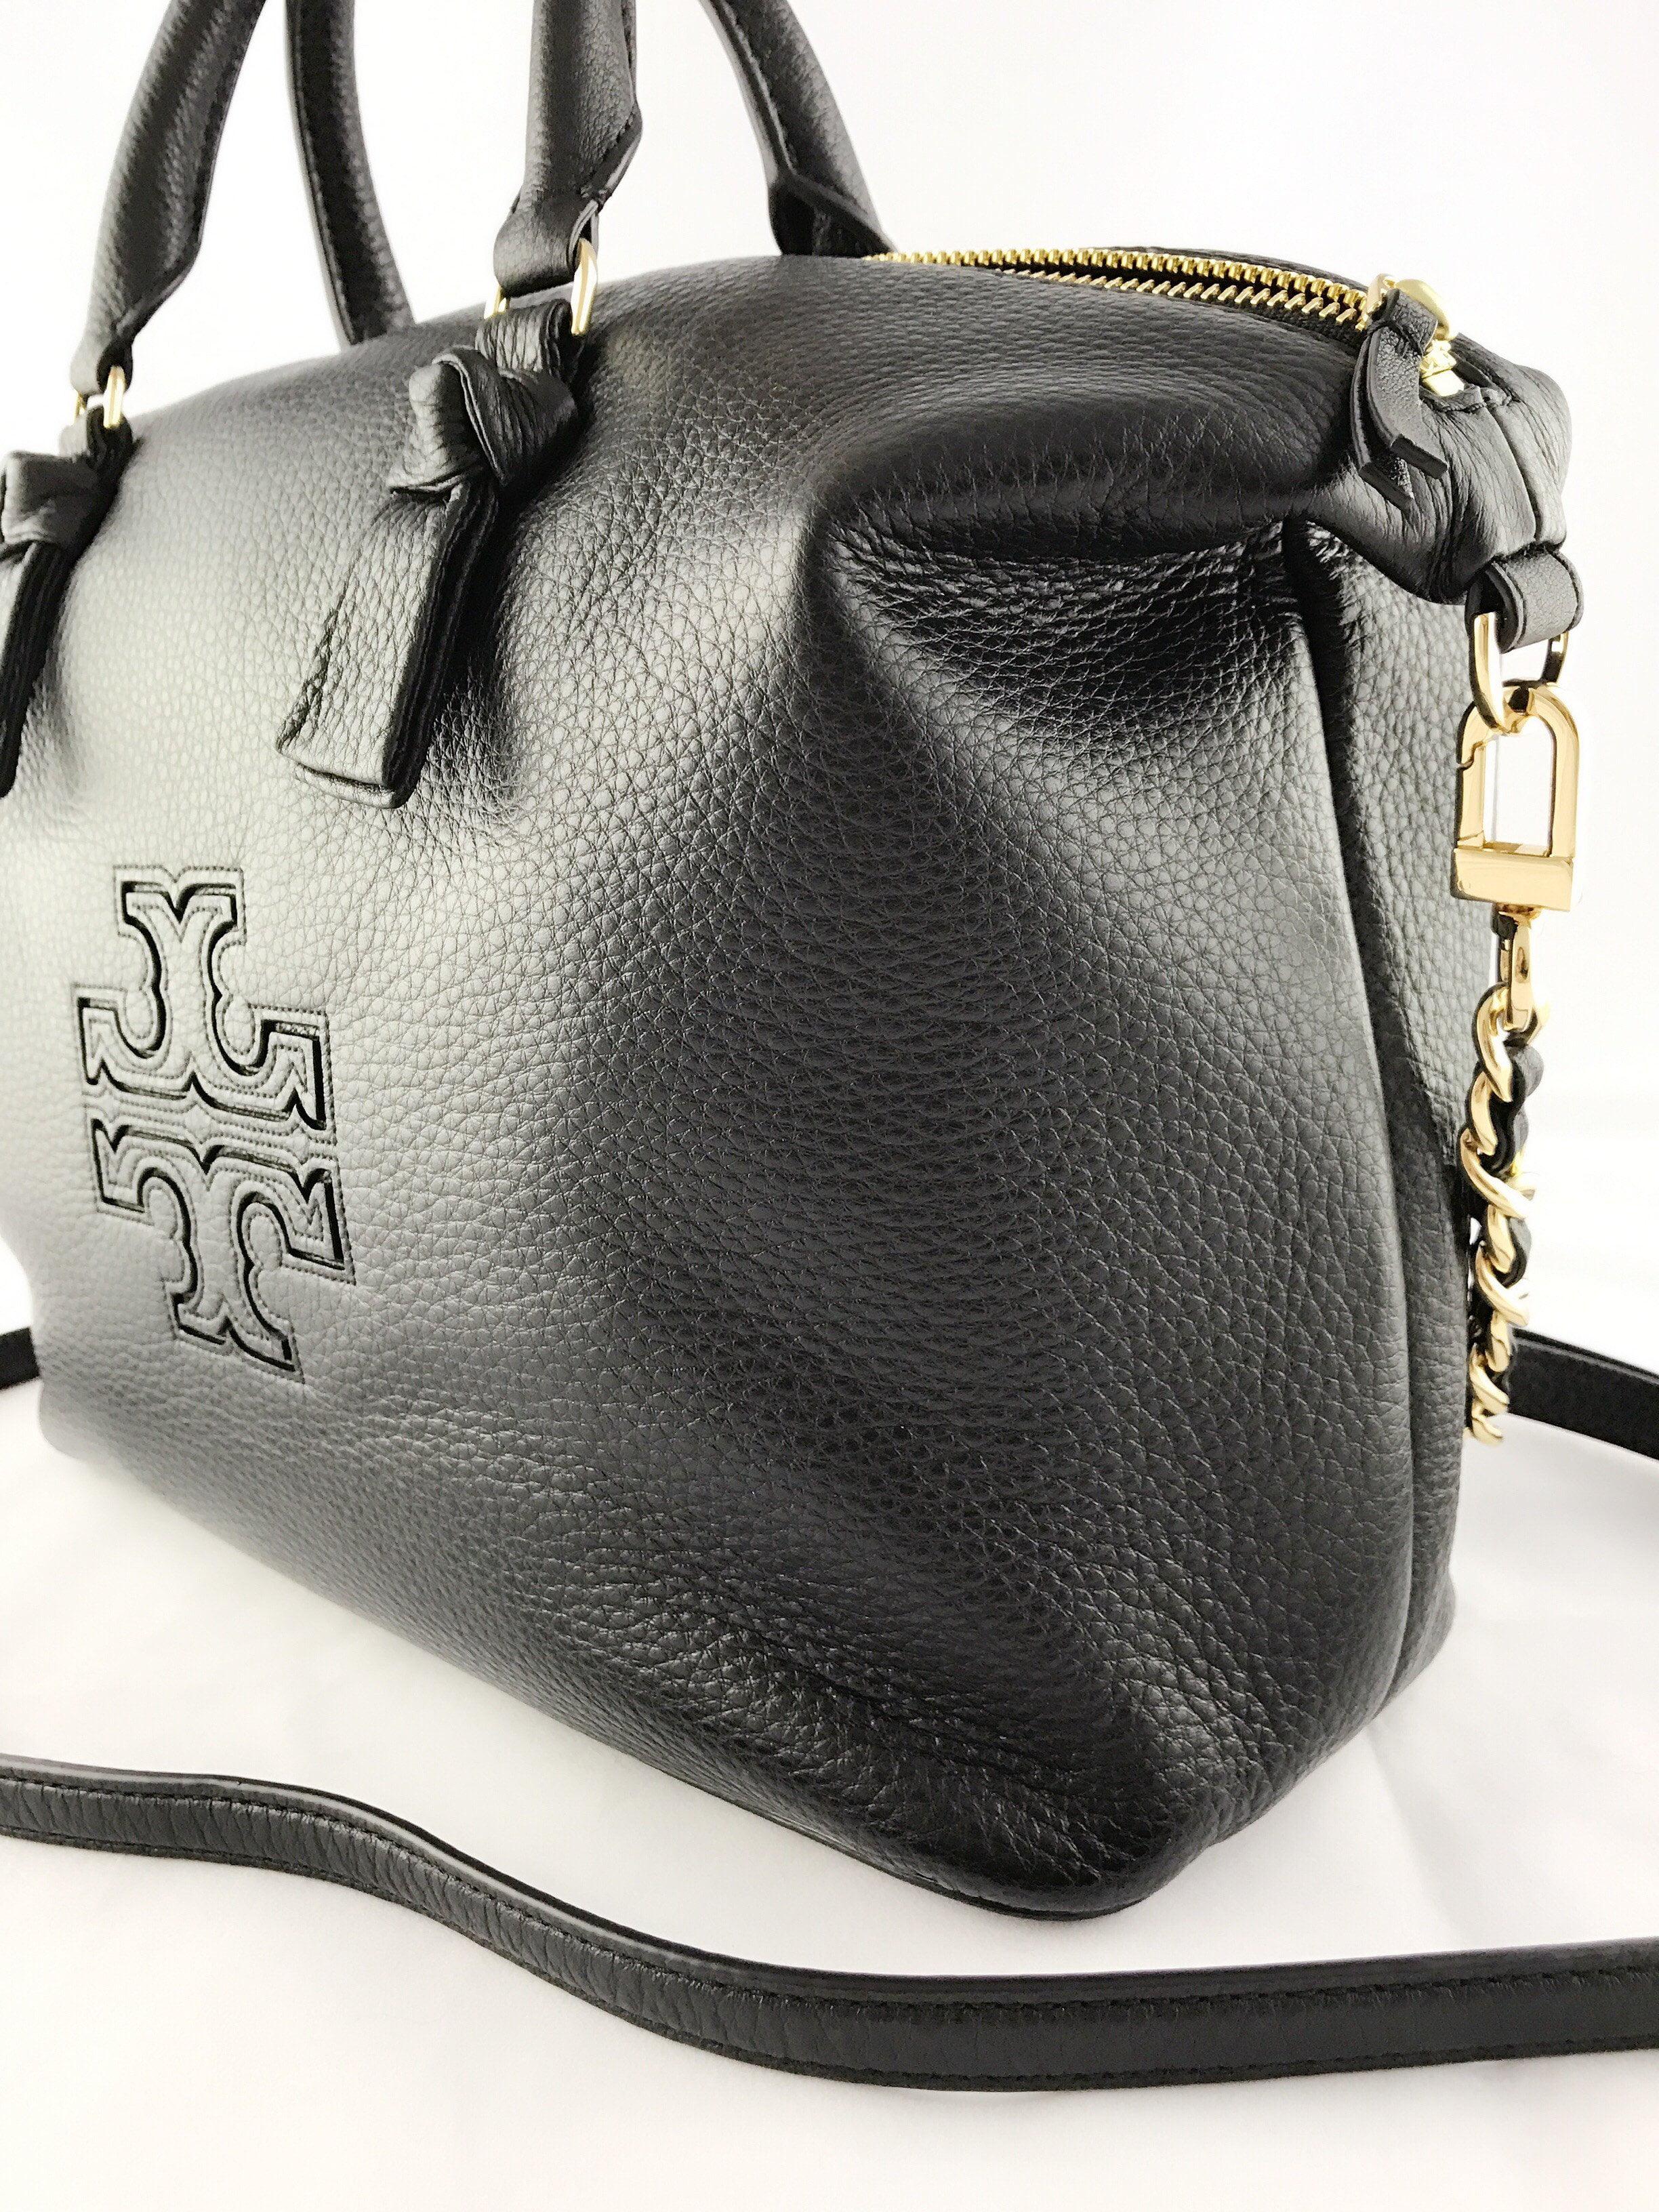 2b7b98ce6c0c Tory Burch - Tory Burch Harper Slouchy Tote Satchel Handbag Black Crossbody  Leather - Walmart.com